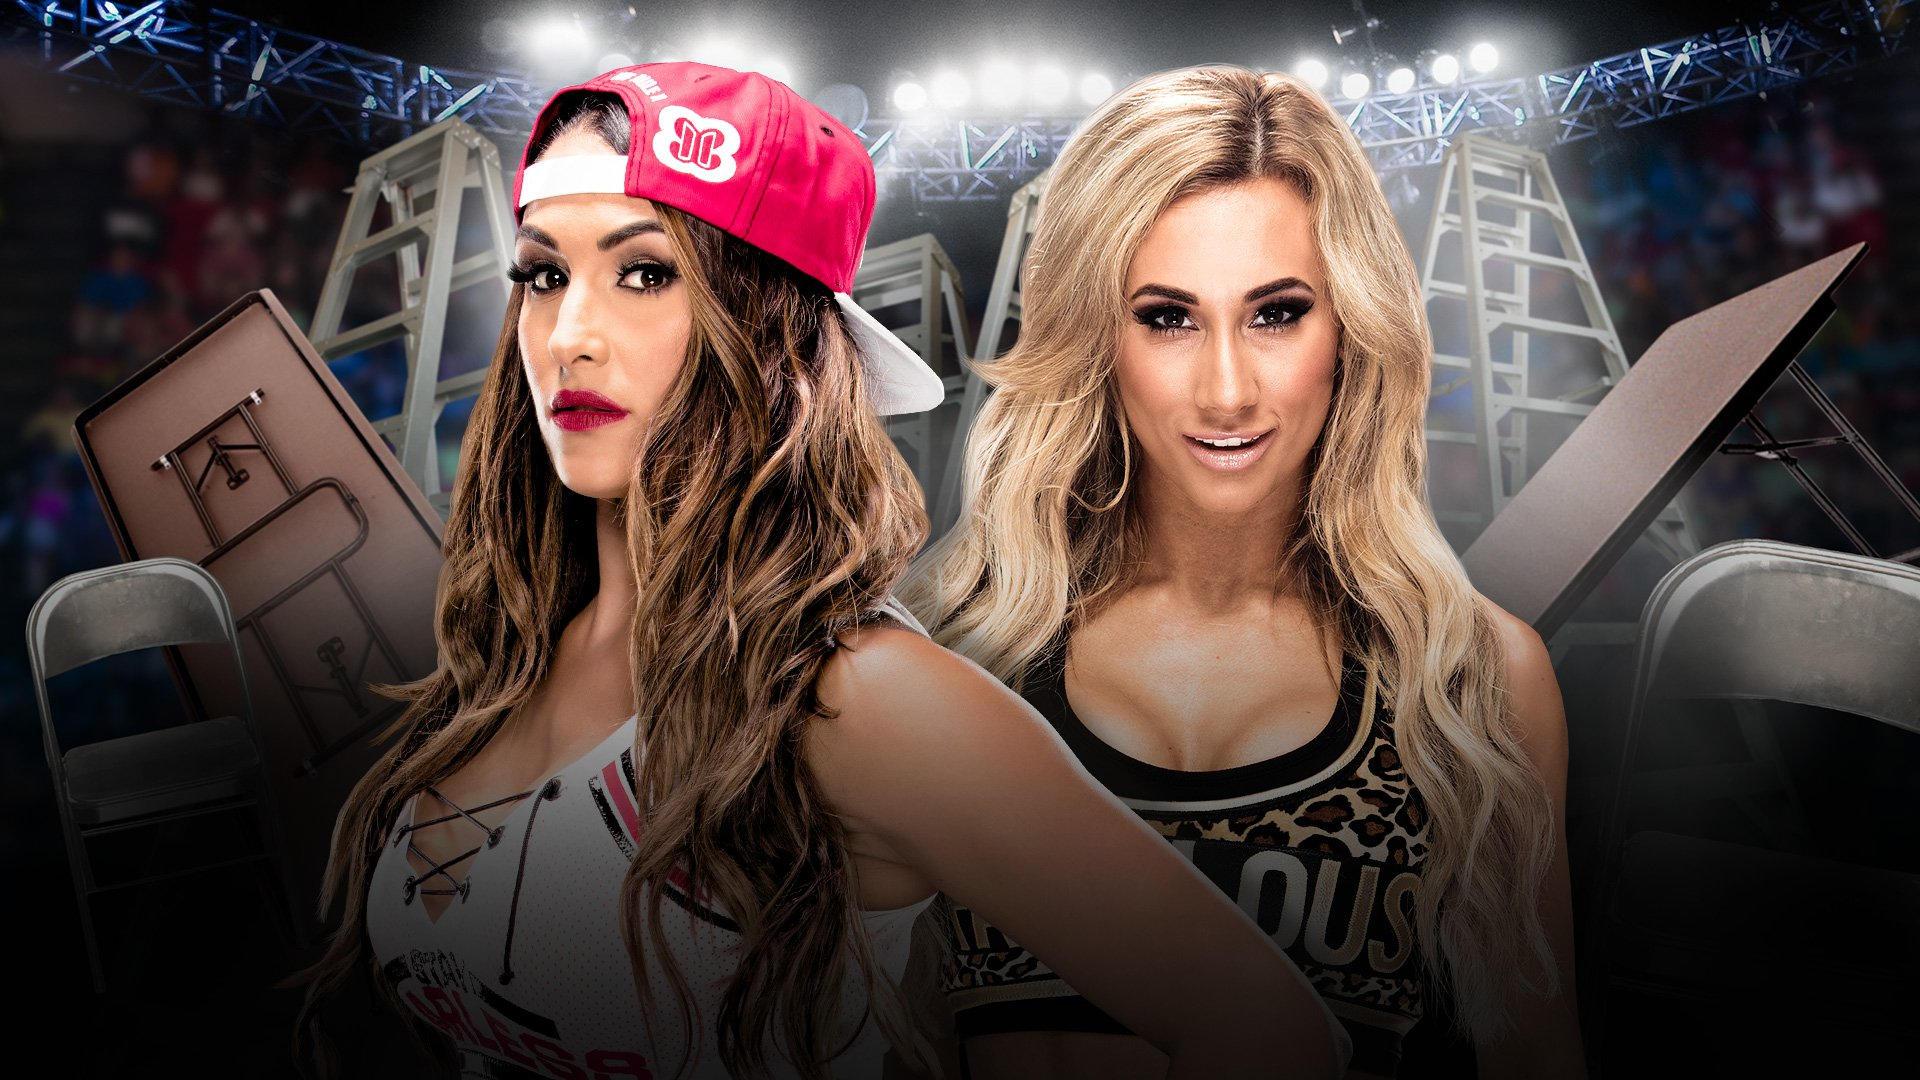 WWE TLC - DECEMBER 4 - DALLAS, TEXAS 20161121_TLC_Match_nikkicarmella--33f23d676676e785826950046bc89063